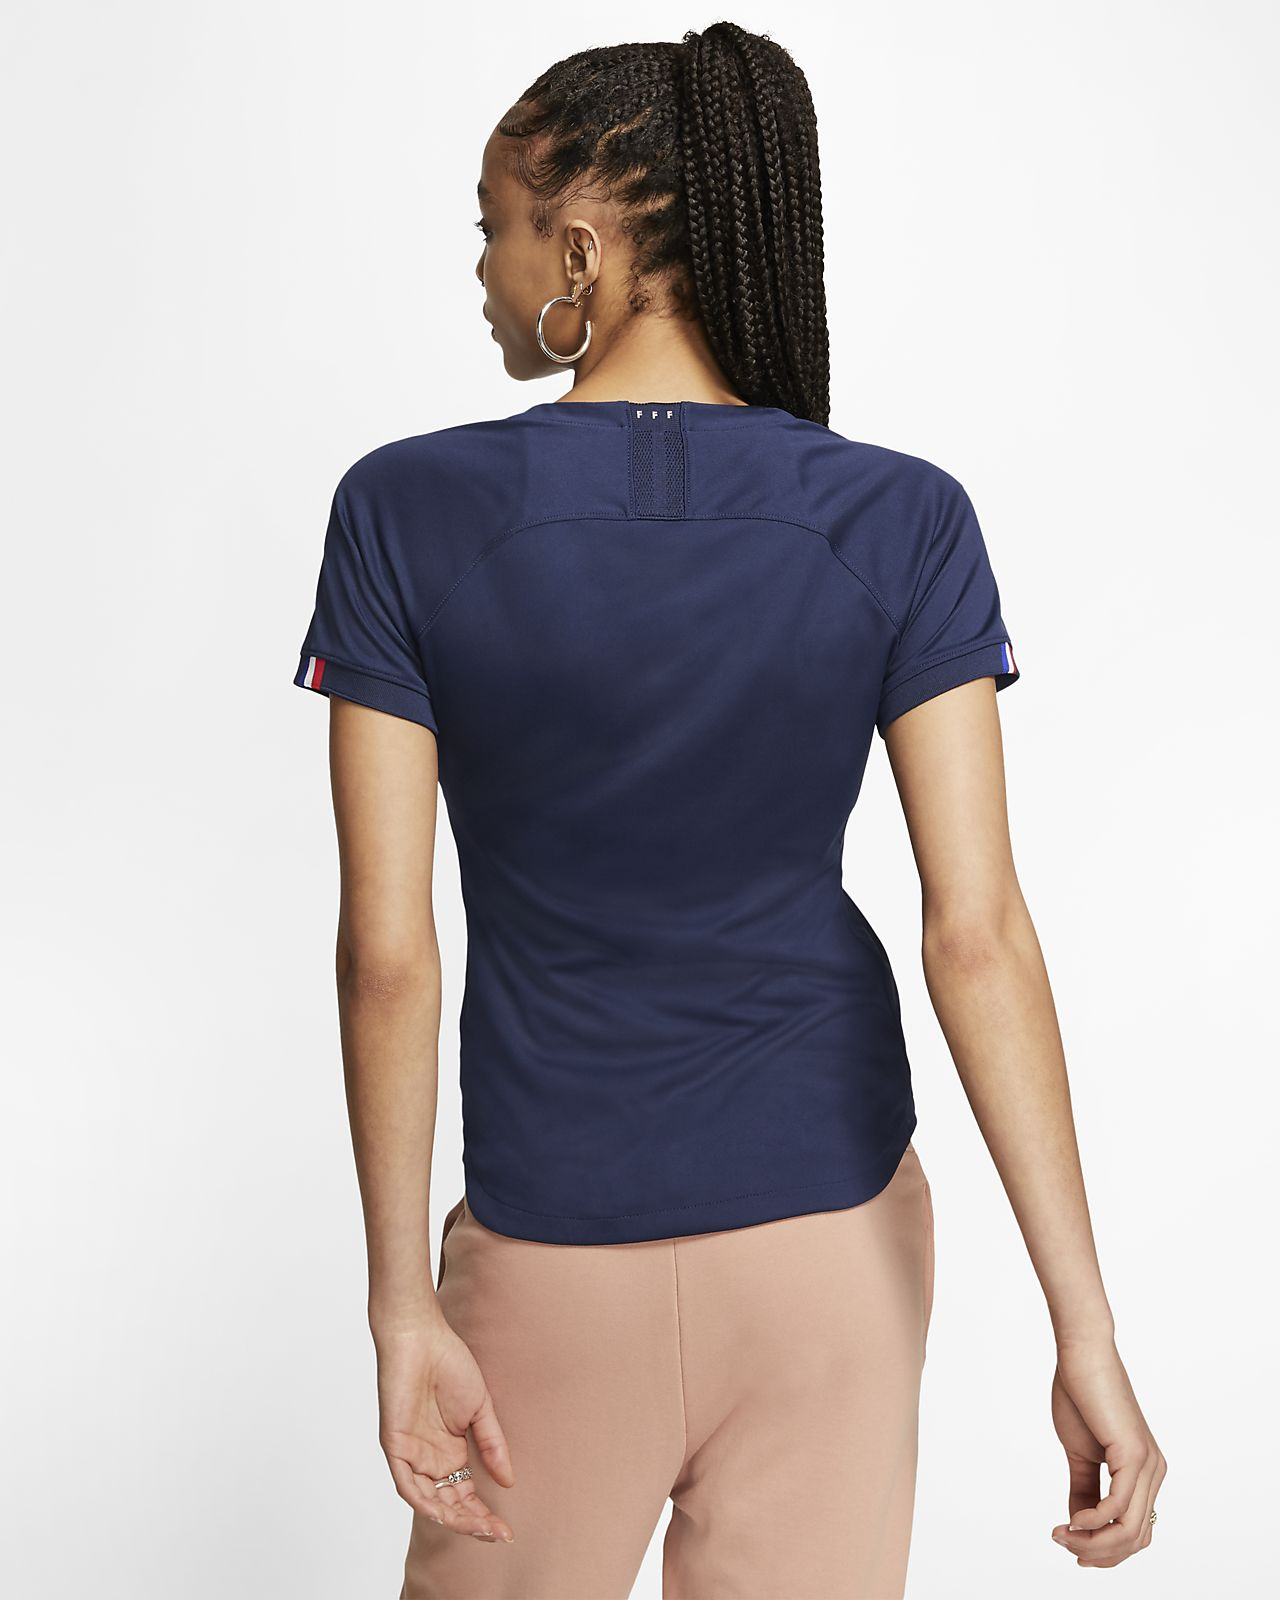 e6f0876f FFF 2019 Stadium Home Women's Football Shirt. Nike.com ZA